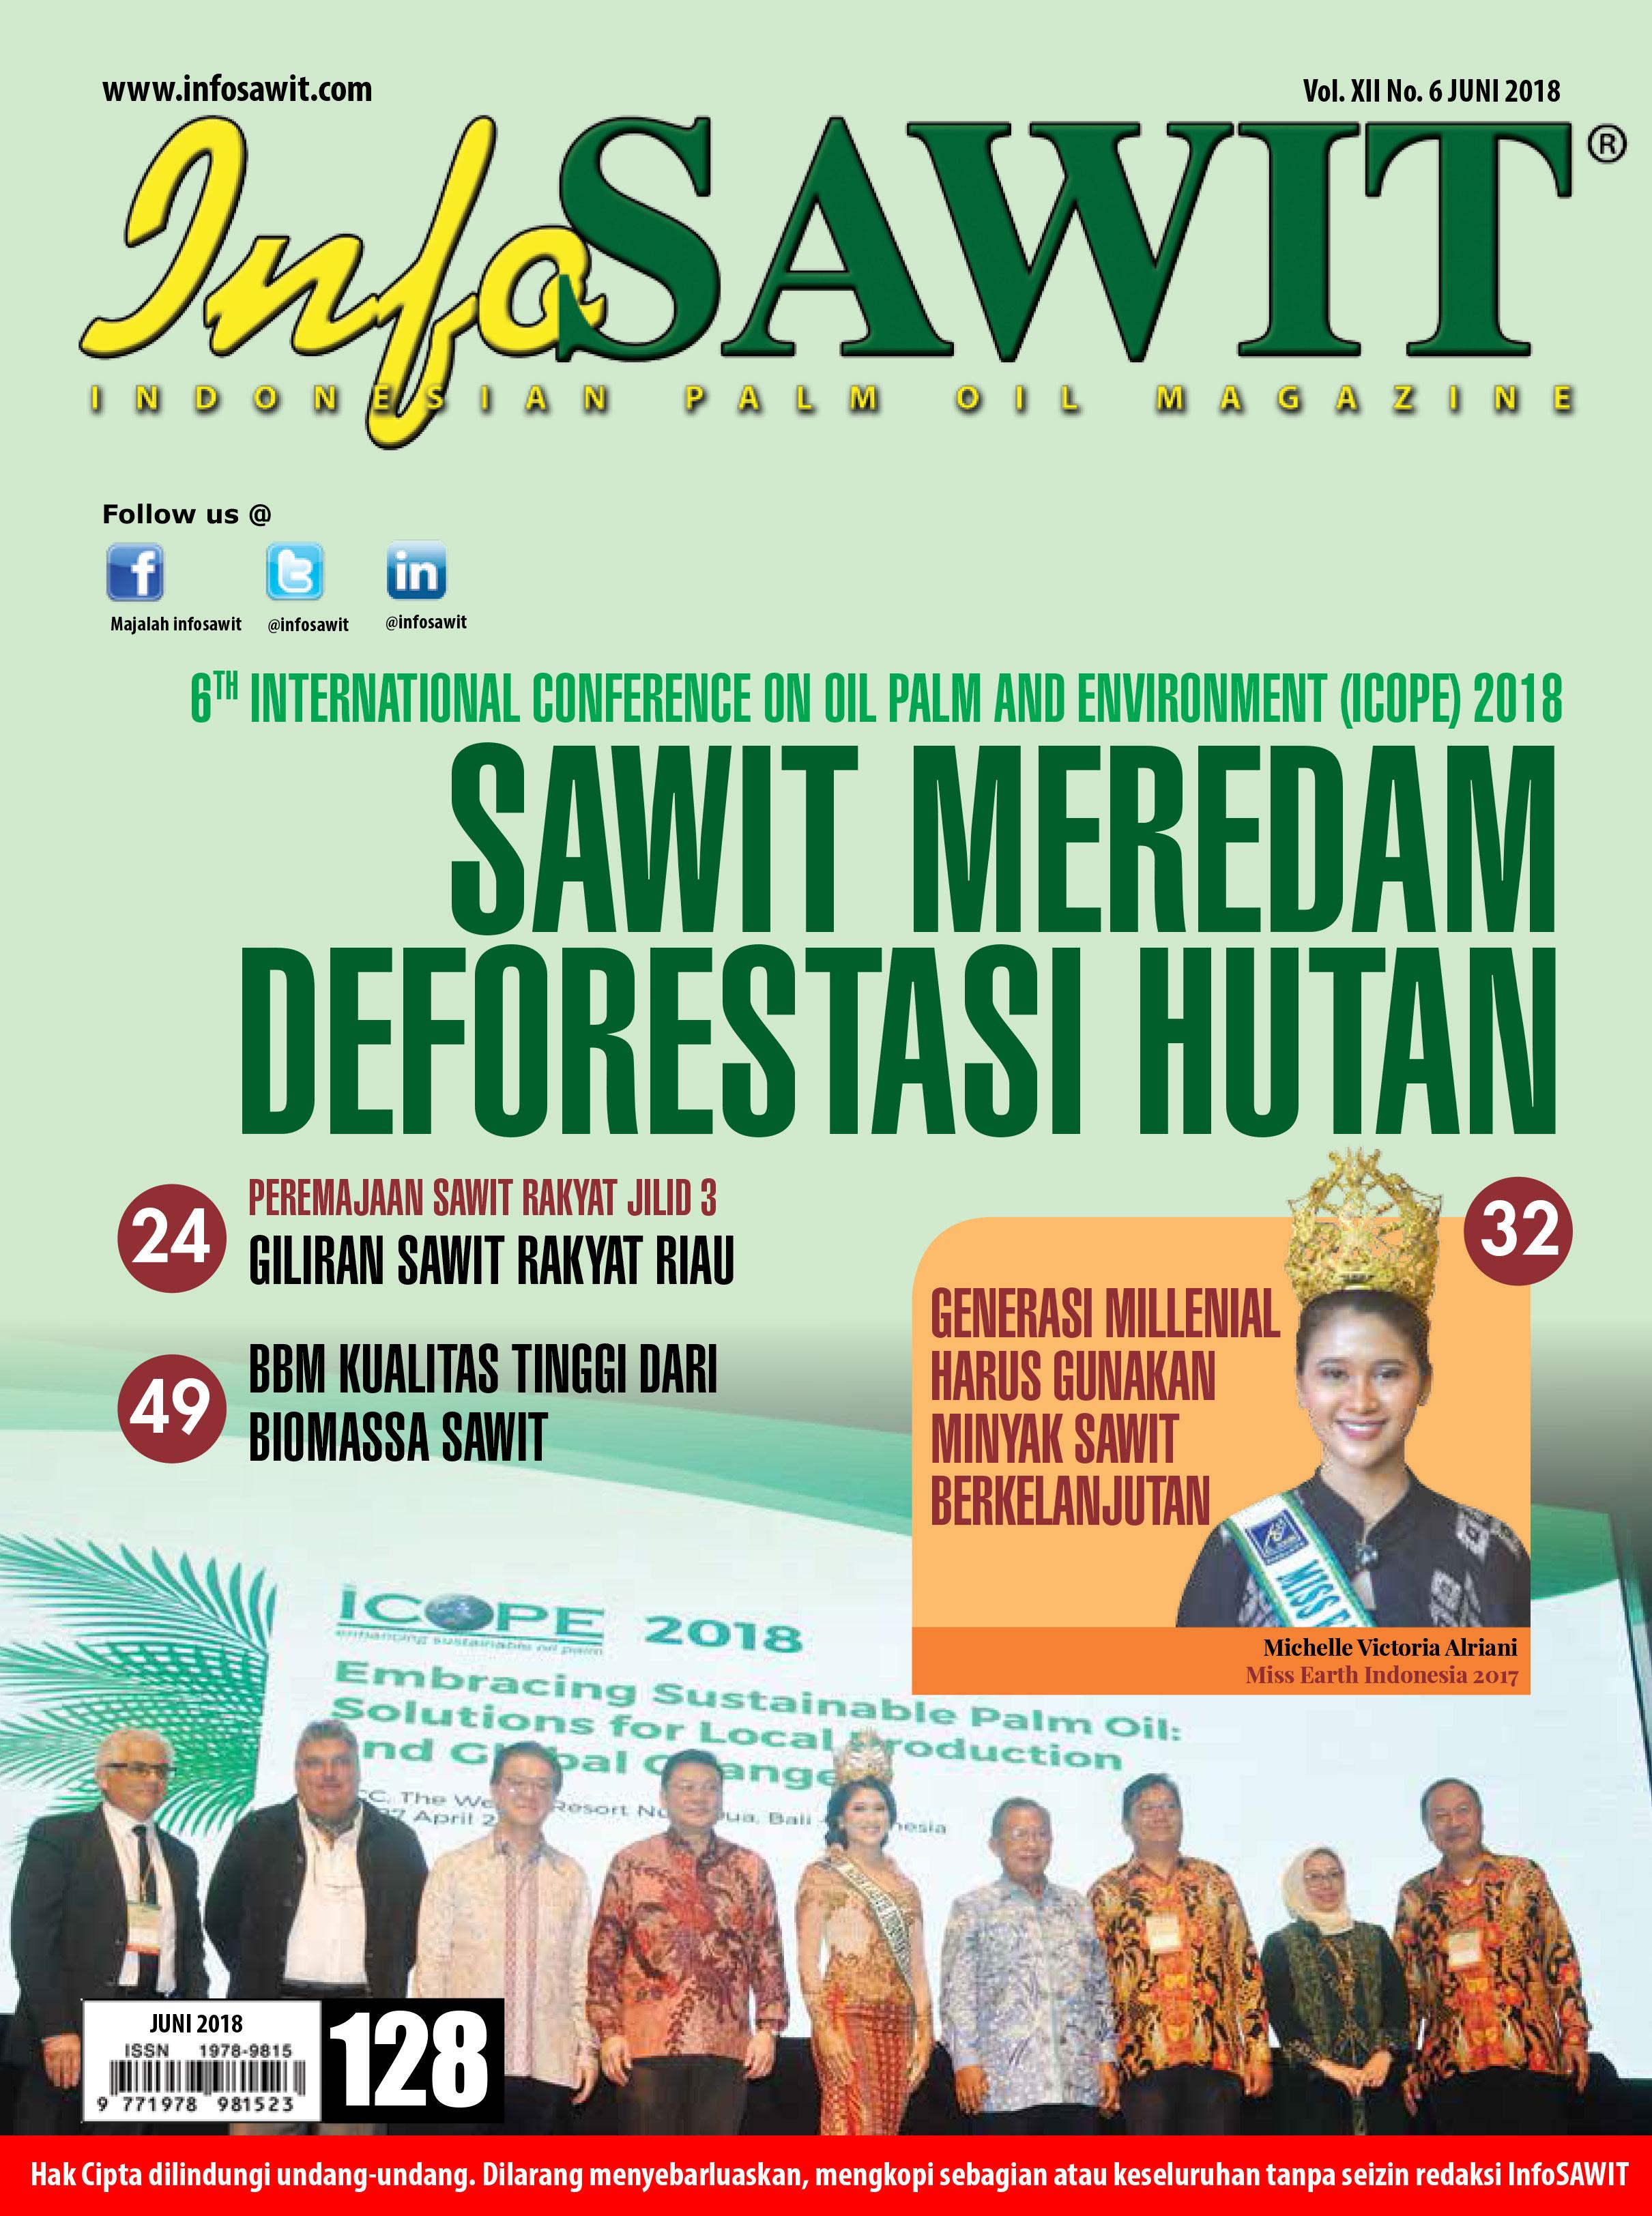 Majalah InfoSAWIT Edisi Juni 2018